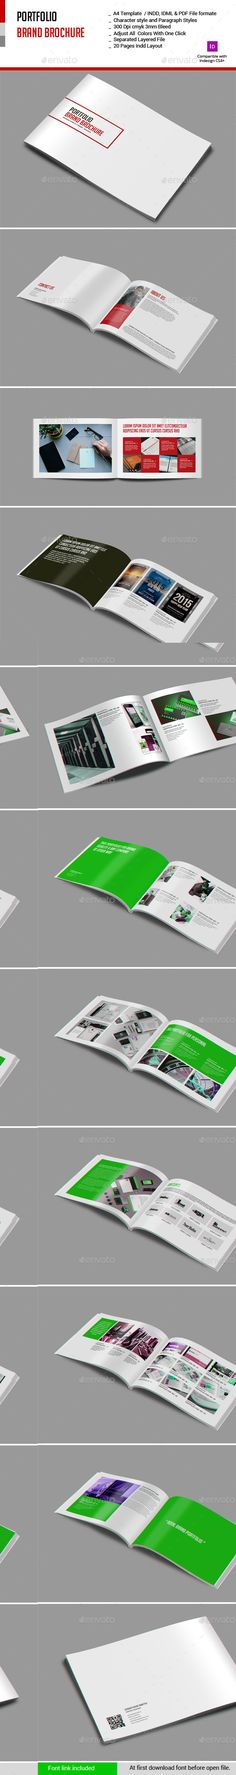 Portfolio Brand Brochure Template. Download: http://graphicriver.net/item/portfolio-brand-brochure/10974788?ref=ksioks